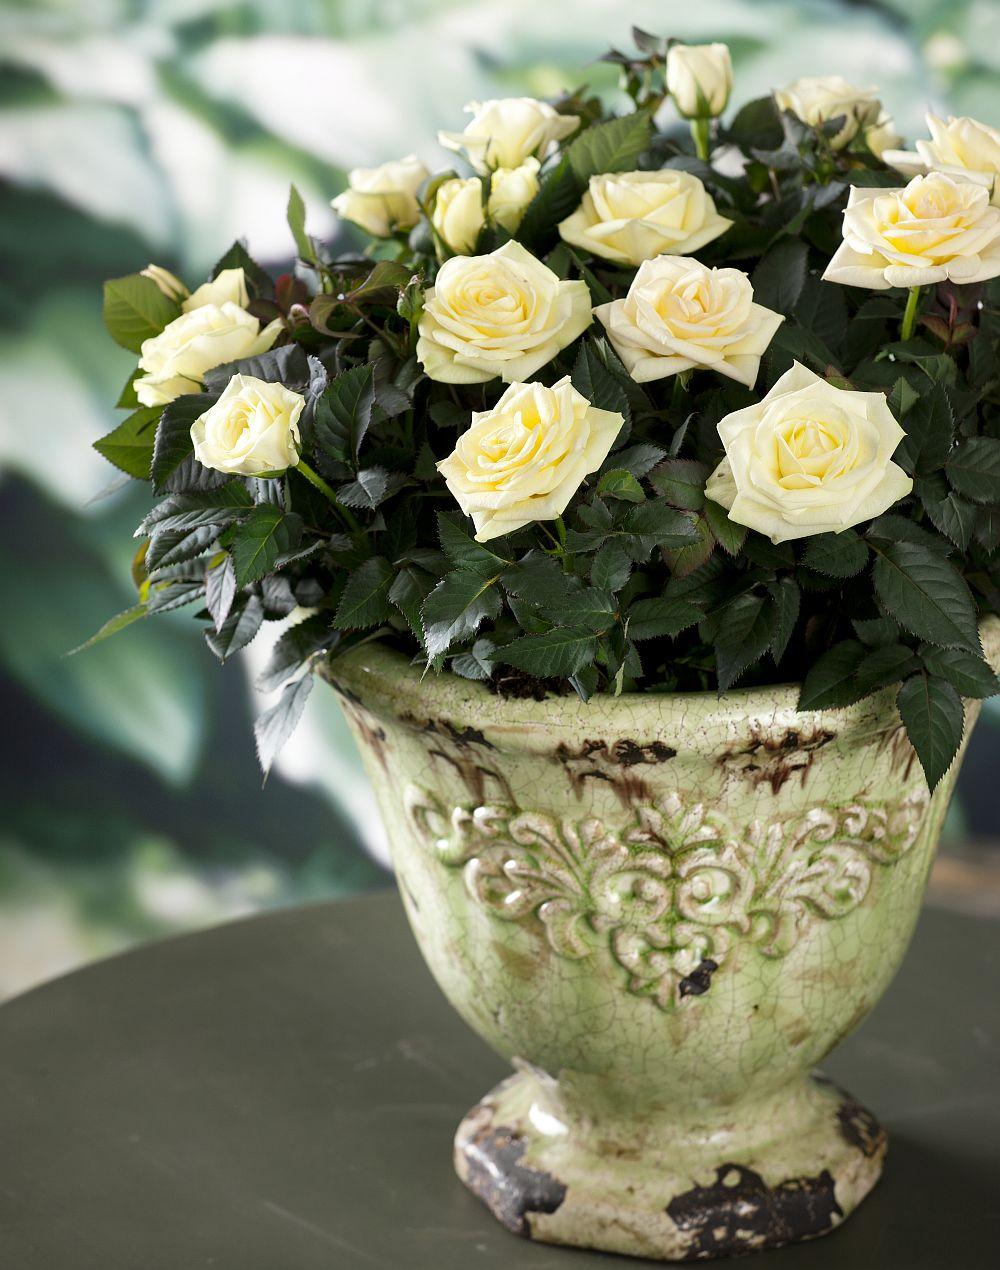 adelaparvu.com despre trandafirii pitici, ingrijirea trandafirilor pitici, Rosa hybrid, text Carli Marian, Foto Floradania (12)